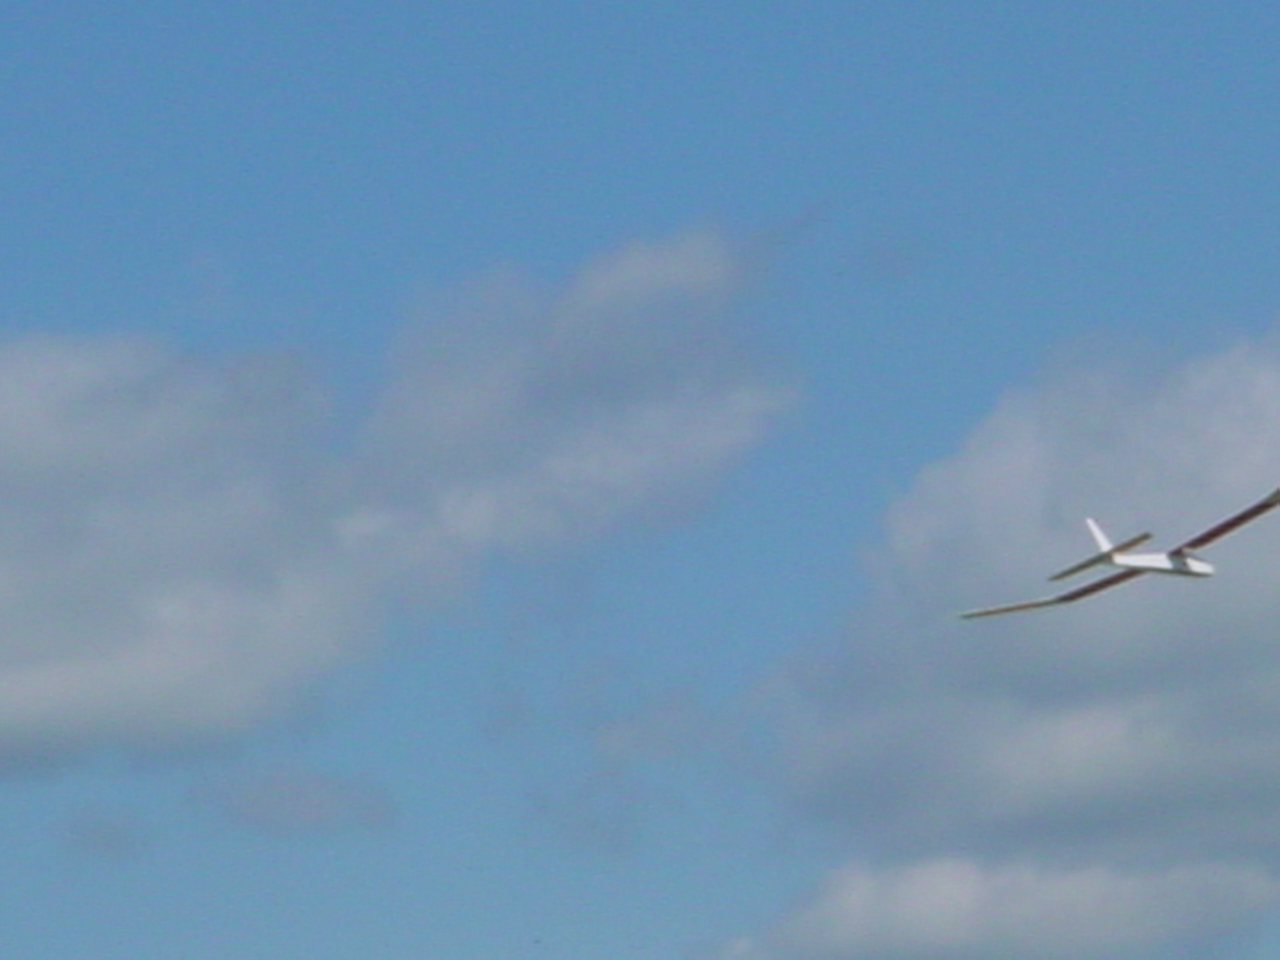 gliders-06-04-06-11